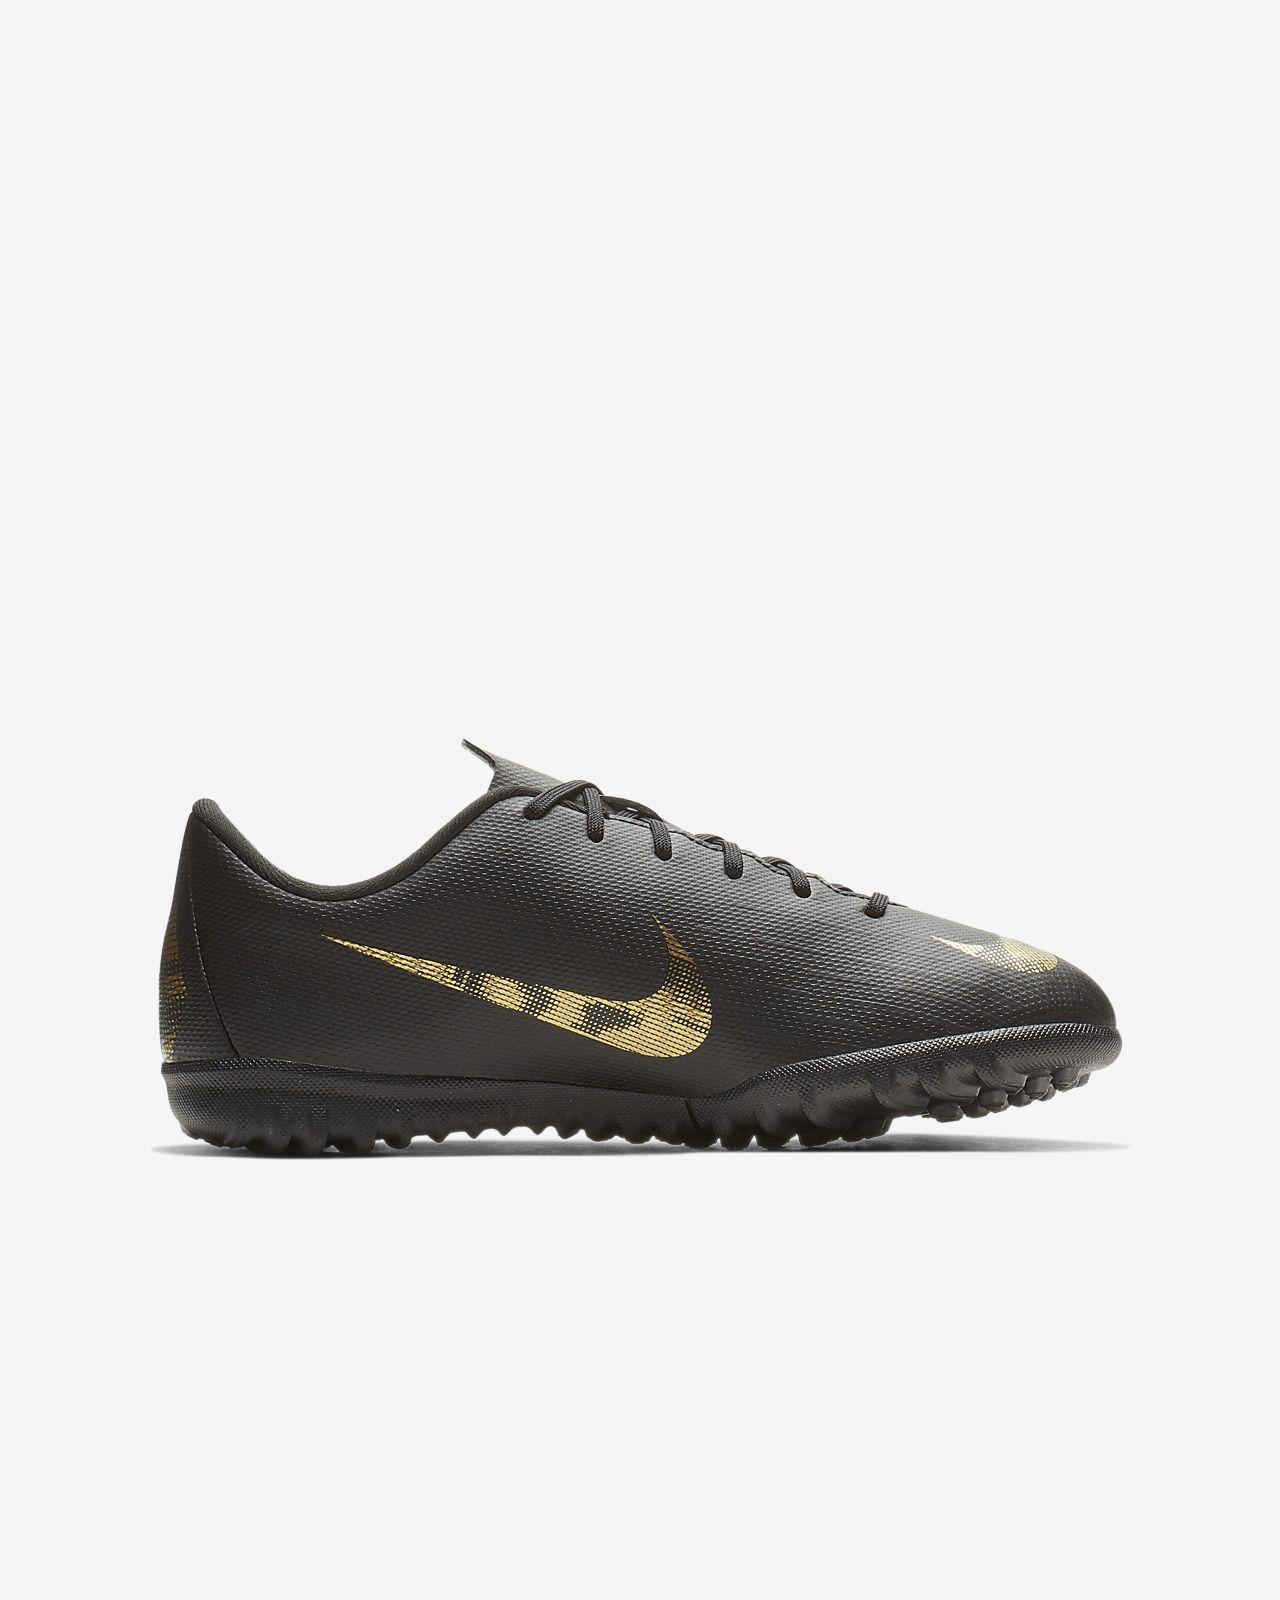 brand new 4fd0c f8e21 ... Scarpa da calcio per erba sintetica Nike Jr. MercurialX Vapor XII  Academy - Bambini/